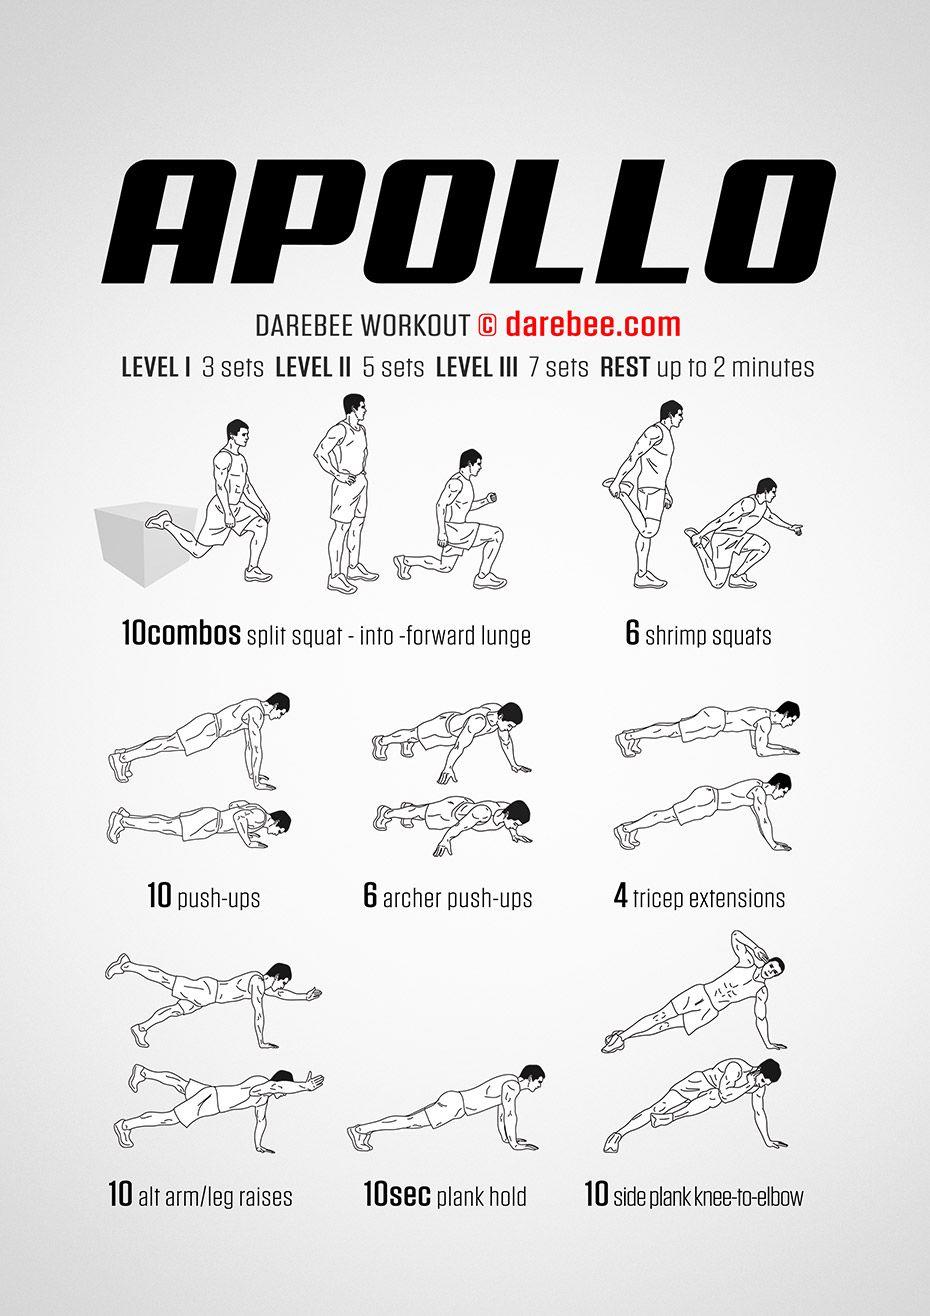 Apollo Workout (avec images) | Exercice musculation, Exercices de fitness, Exercice